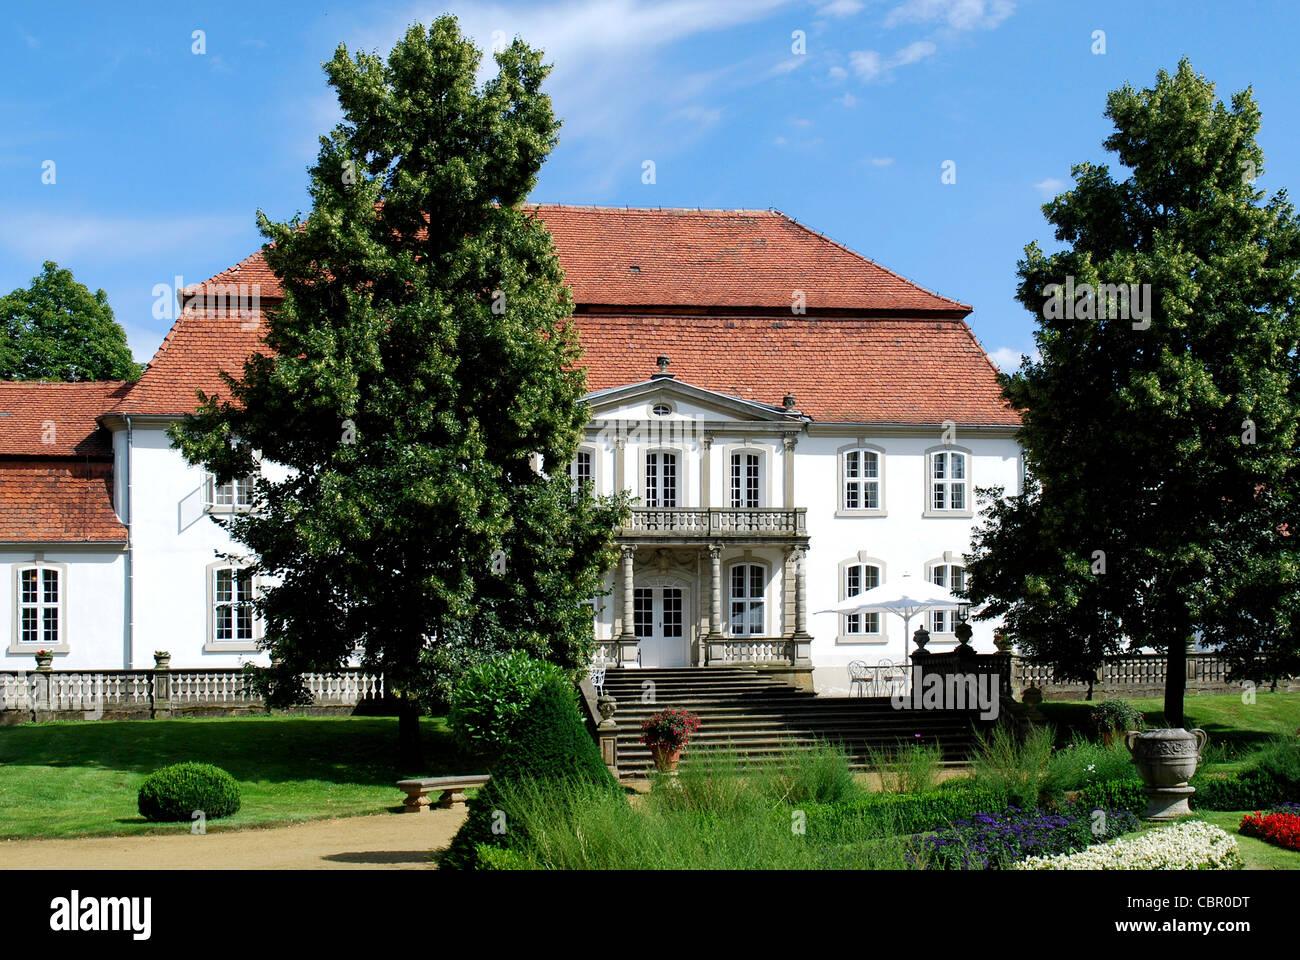 Wiepersdorf castle near Jueterbog in Brandenburg. - Stock Image